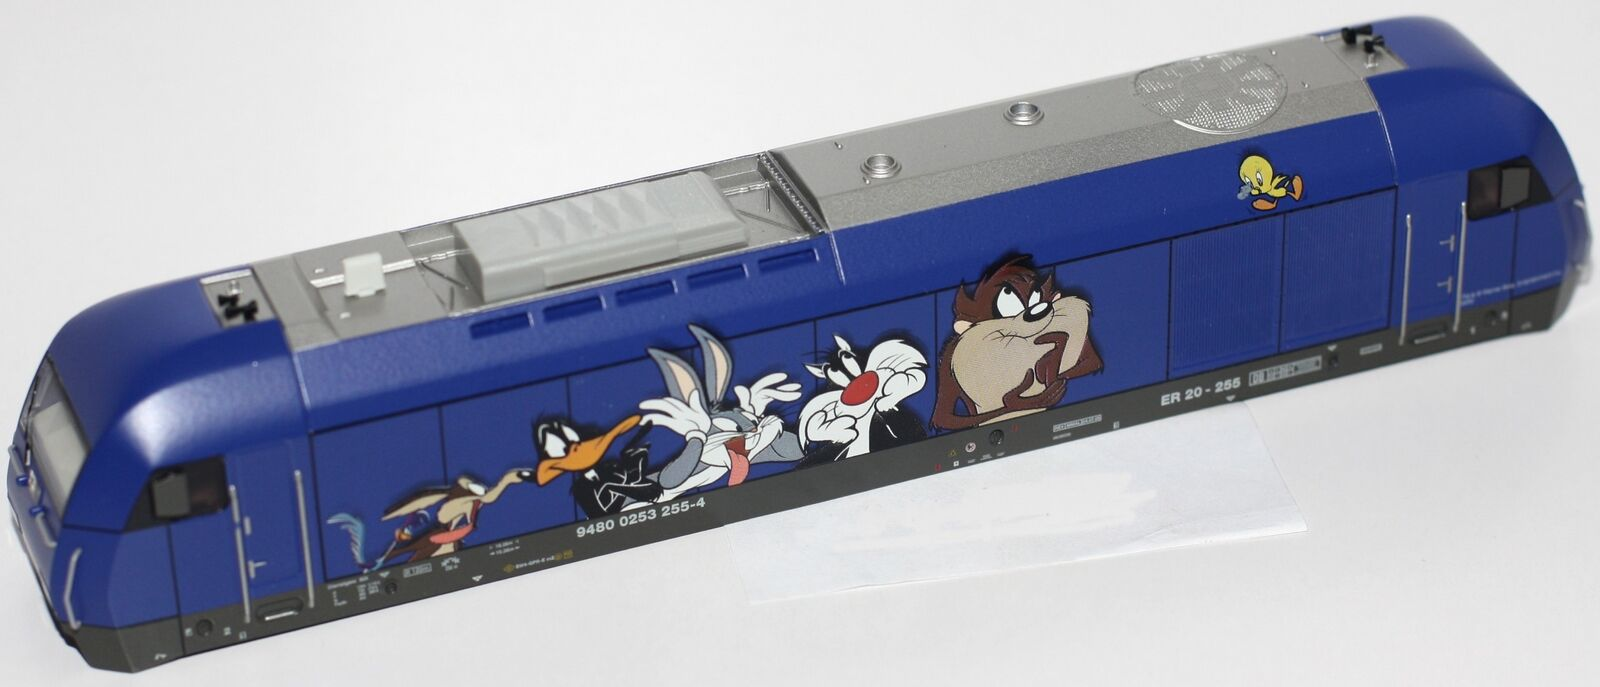 Märklin H0 101931 Gehäuse für Lok 36847 Looney Tunes